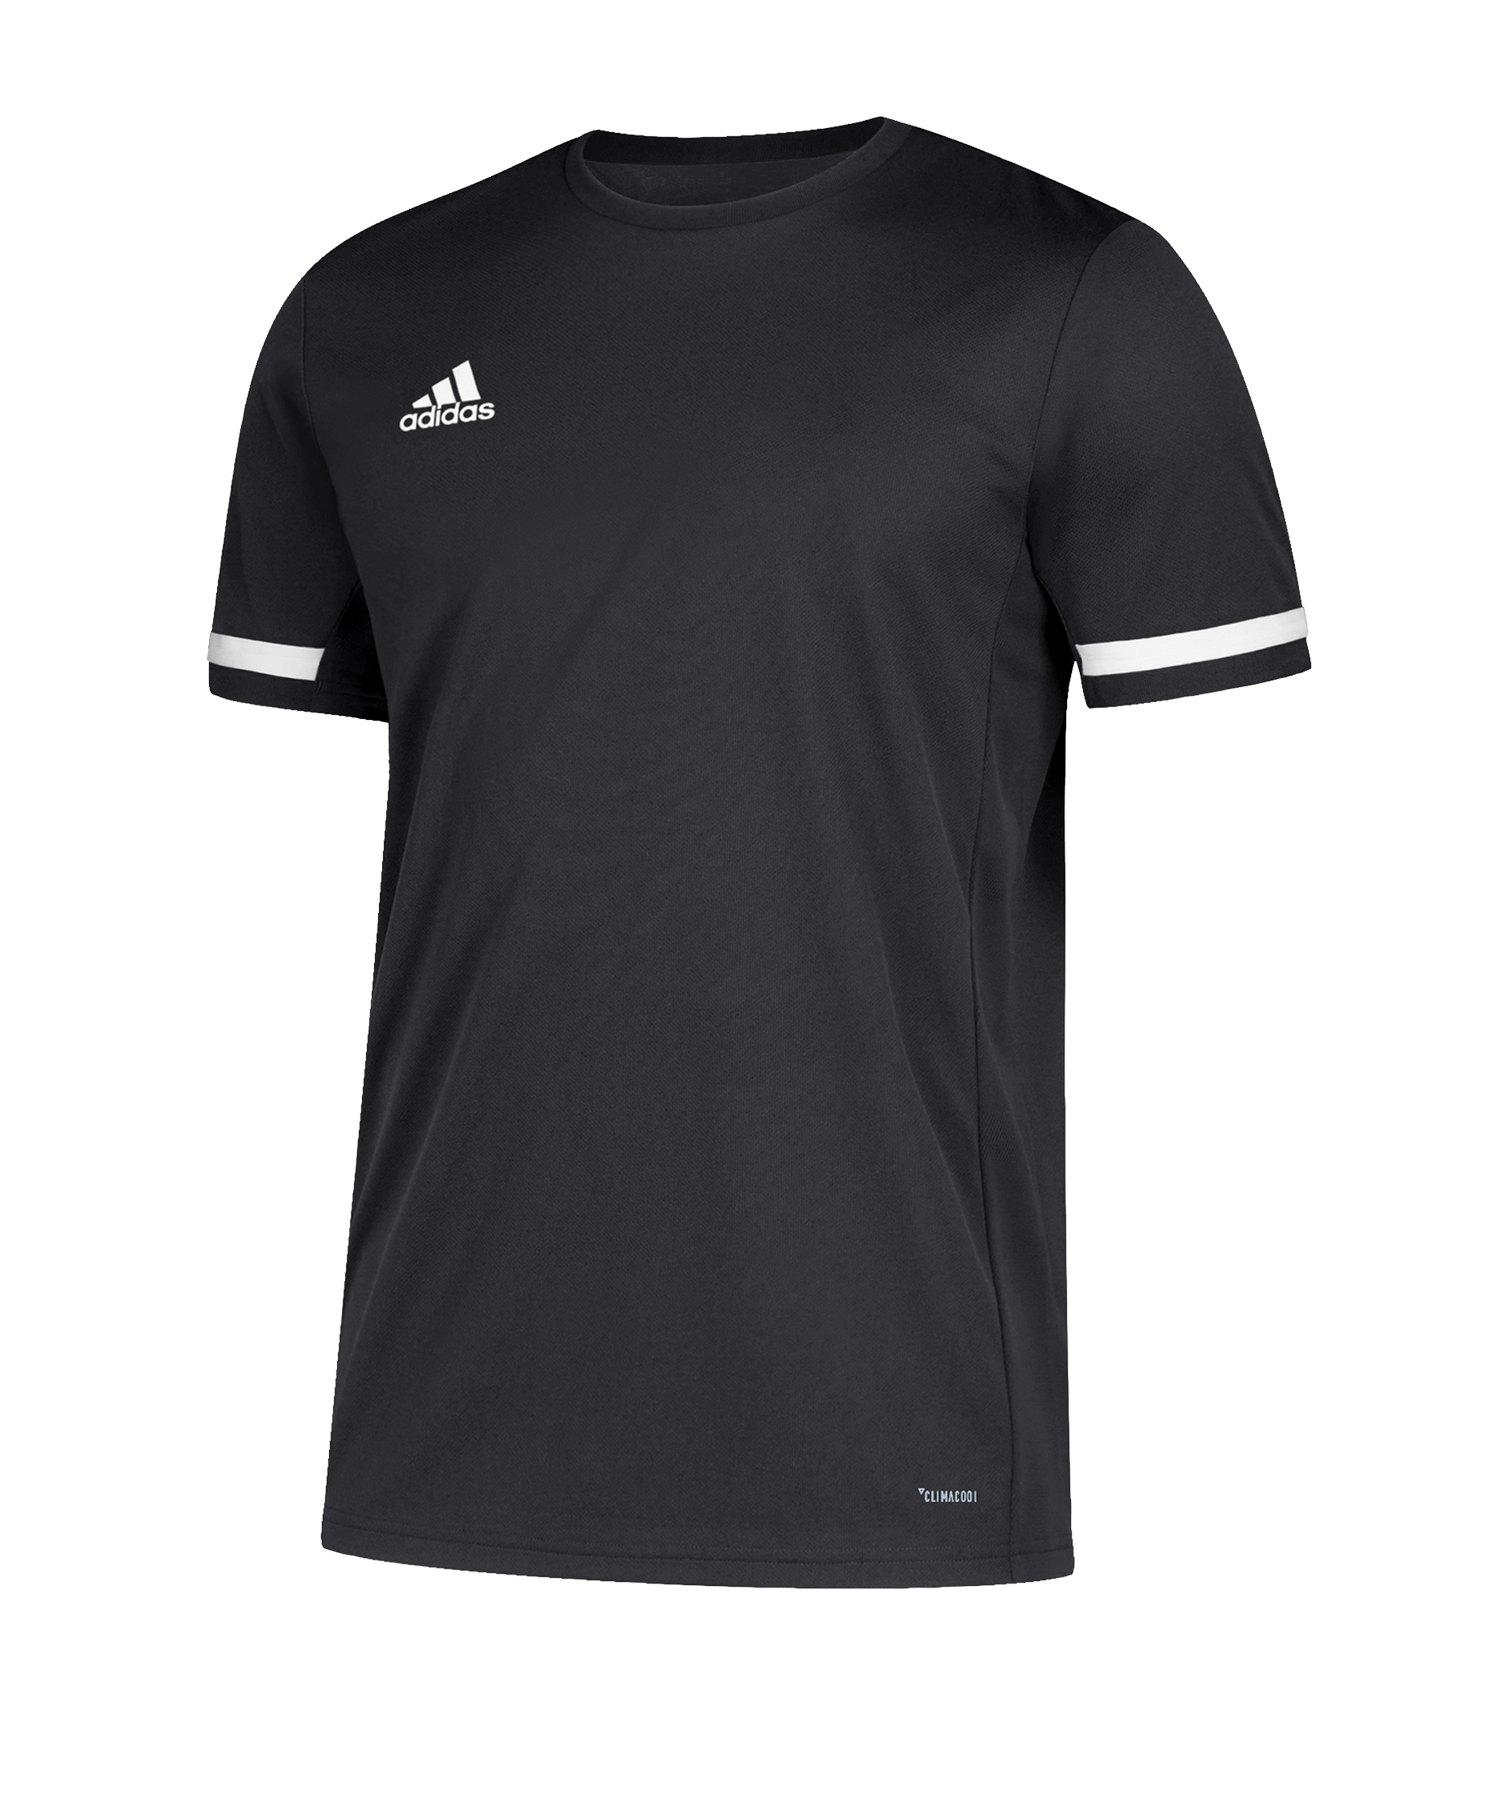 a136a8e80c adidas Team 19 Trikot kurzarm Schwarz Weiss | Teamsport | Textil ...